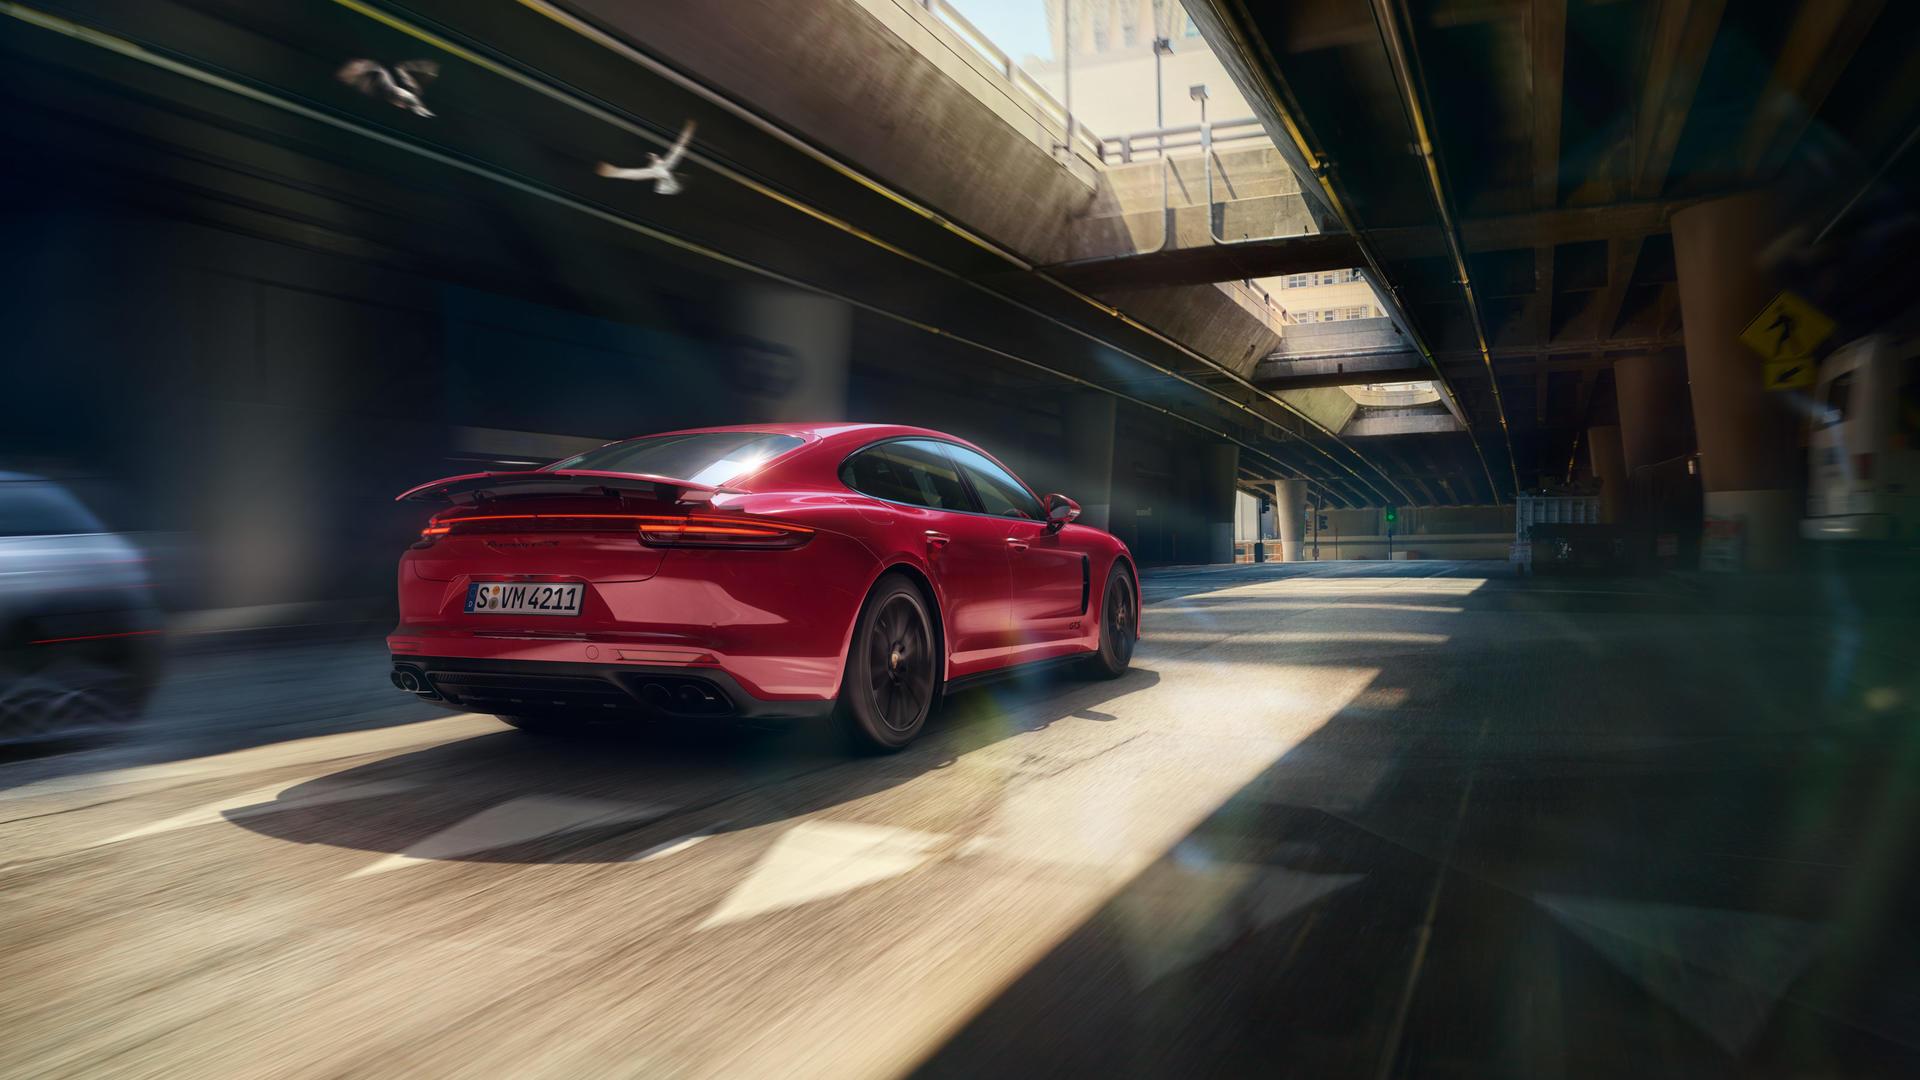 2019 Porsche Panamera GTS (Color: Carmine Red) Rear Wallpaper (5)